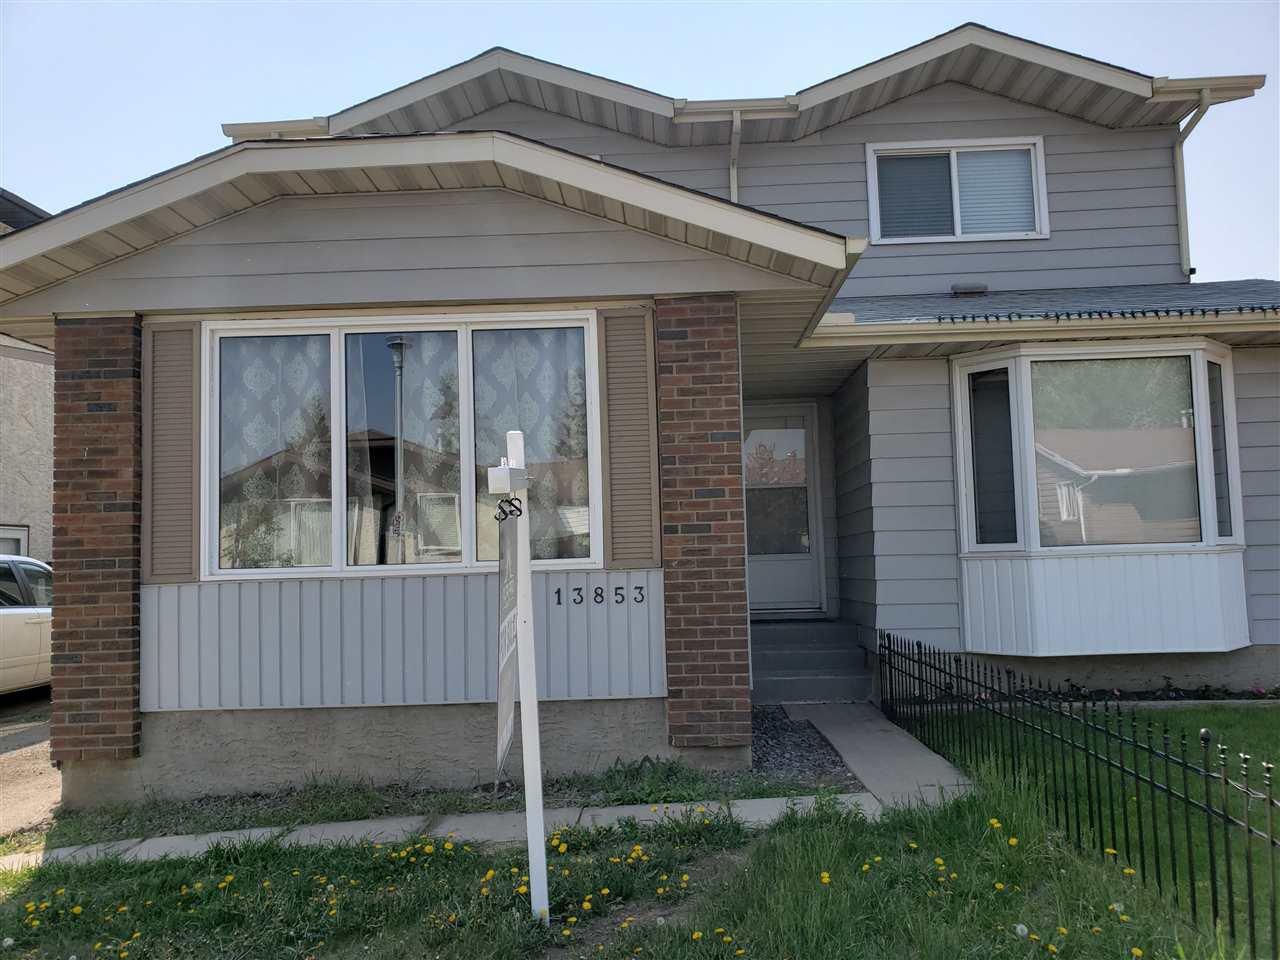 Main Photo: 13853 114 Street in Edmonton: Zone 27 House Half Duplex for sale : MLS®# E4156257